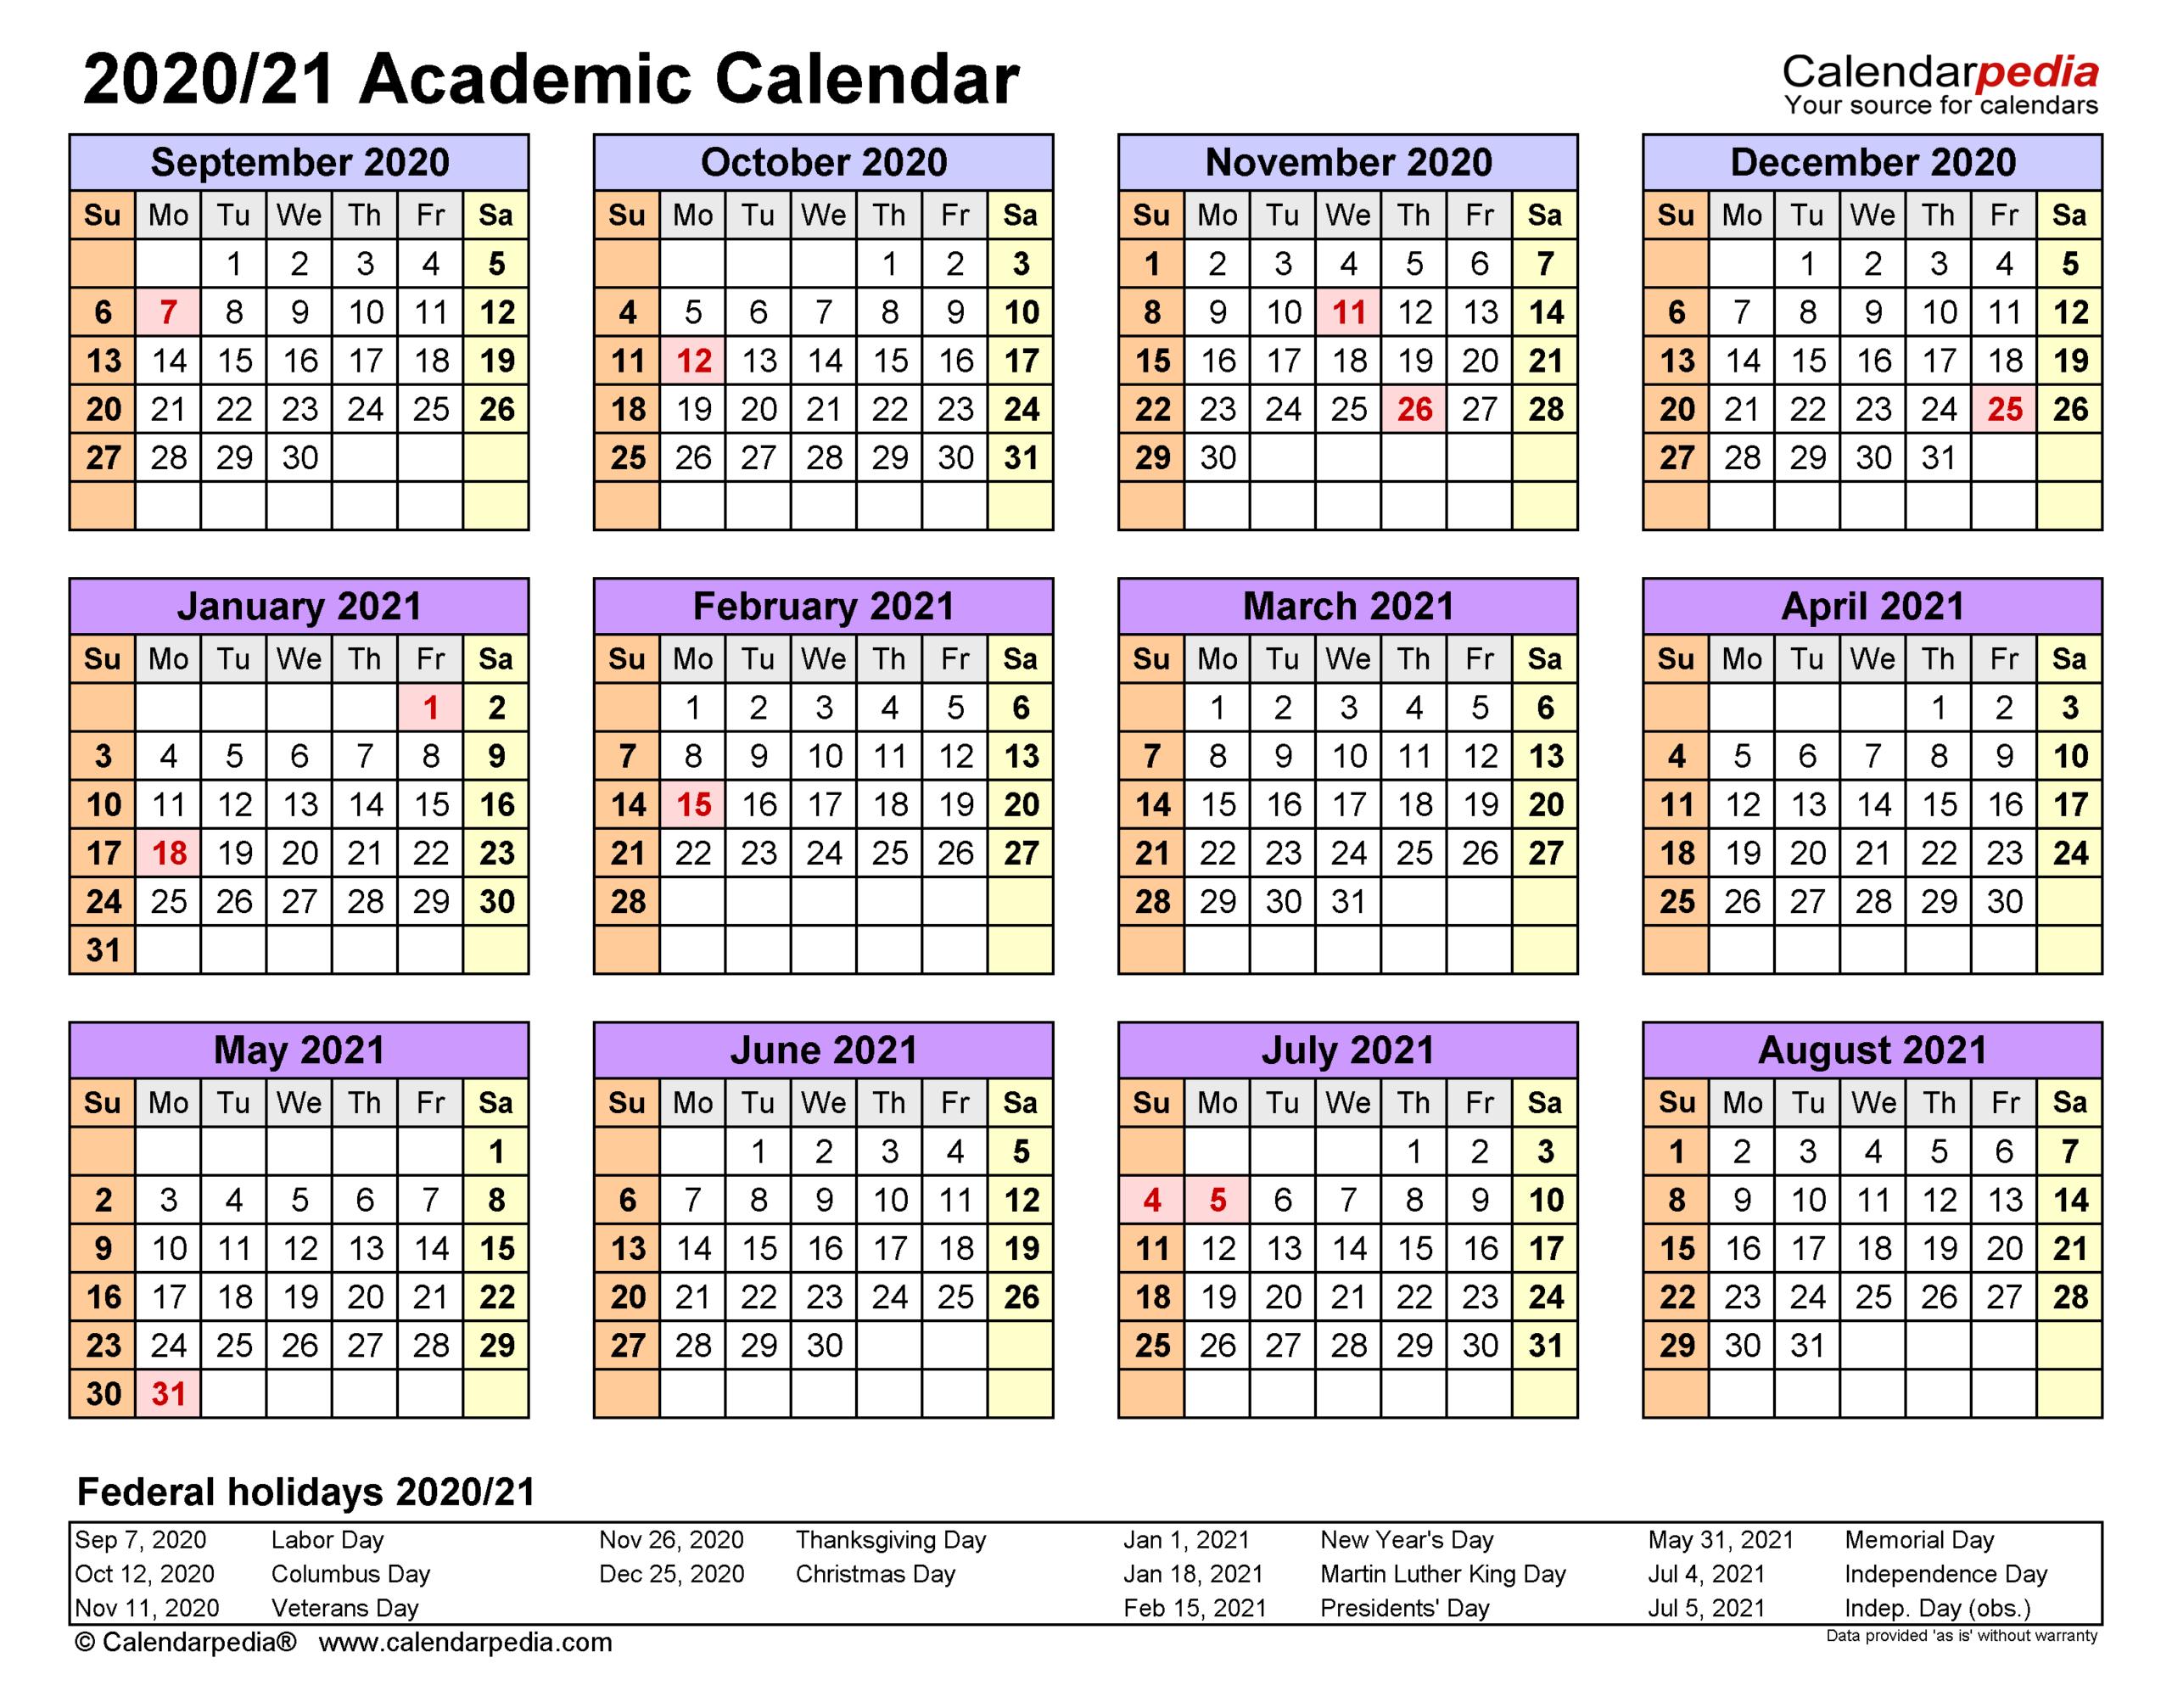 Academic Calendars 2020/2021 - Free Printable Word Templates with Vertex Academic Calendar